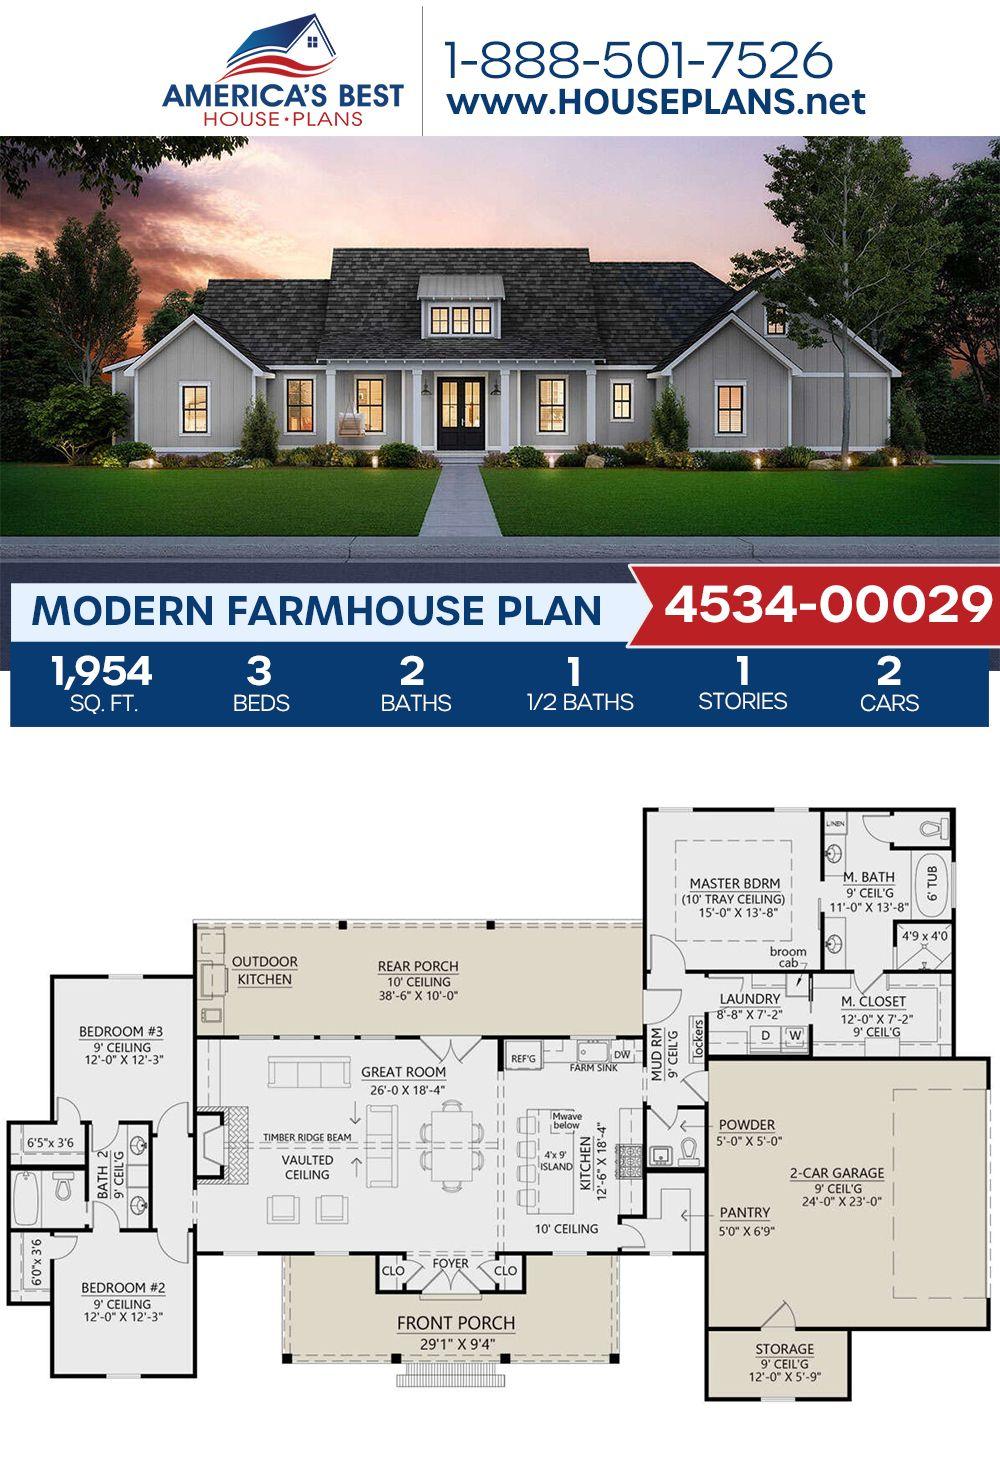 House Plan 4534 00029 Modern Farmhouse Plan 1 954 Square Feet 3 Bedrooms 2 5 Bathrooms House Plans Farmhouse Modern Farmhouse Plans Farmhouse Plans